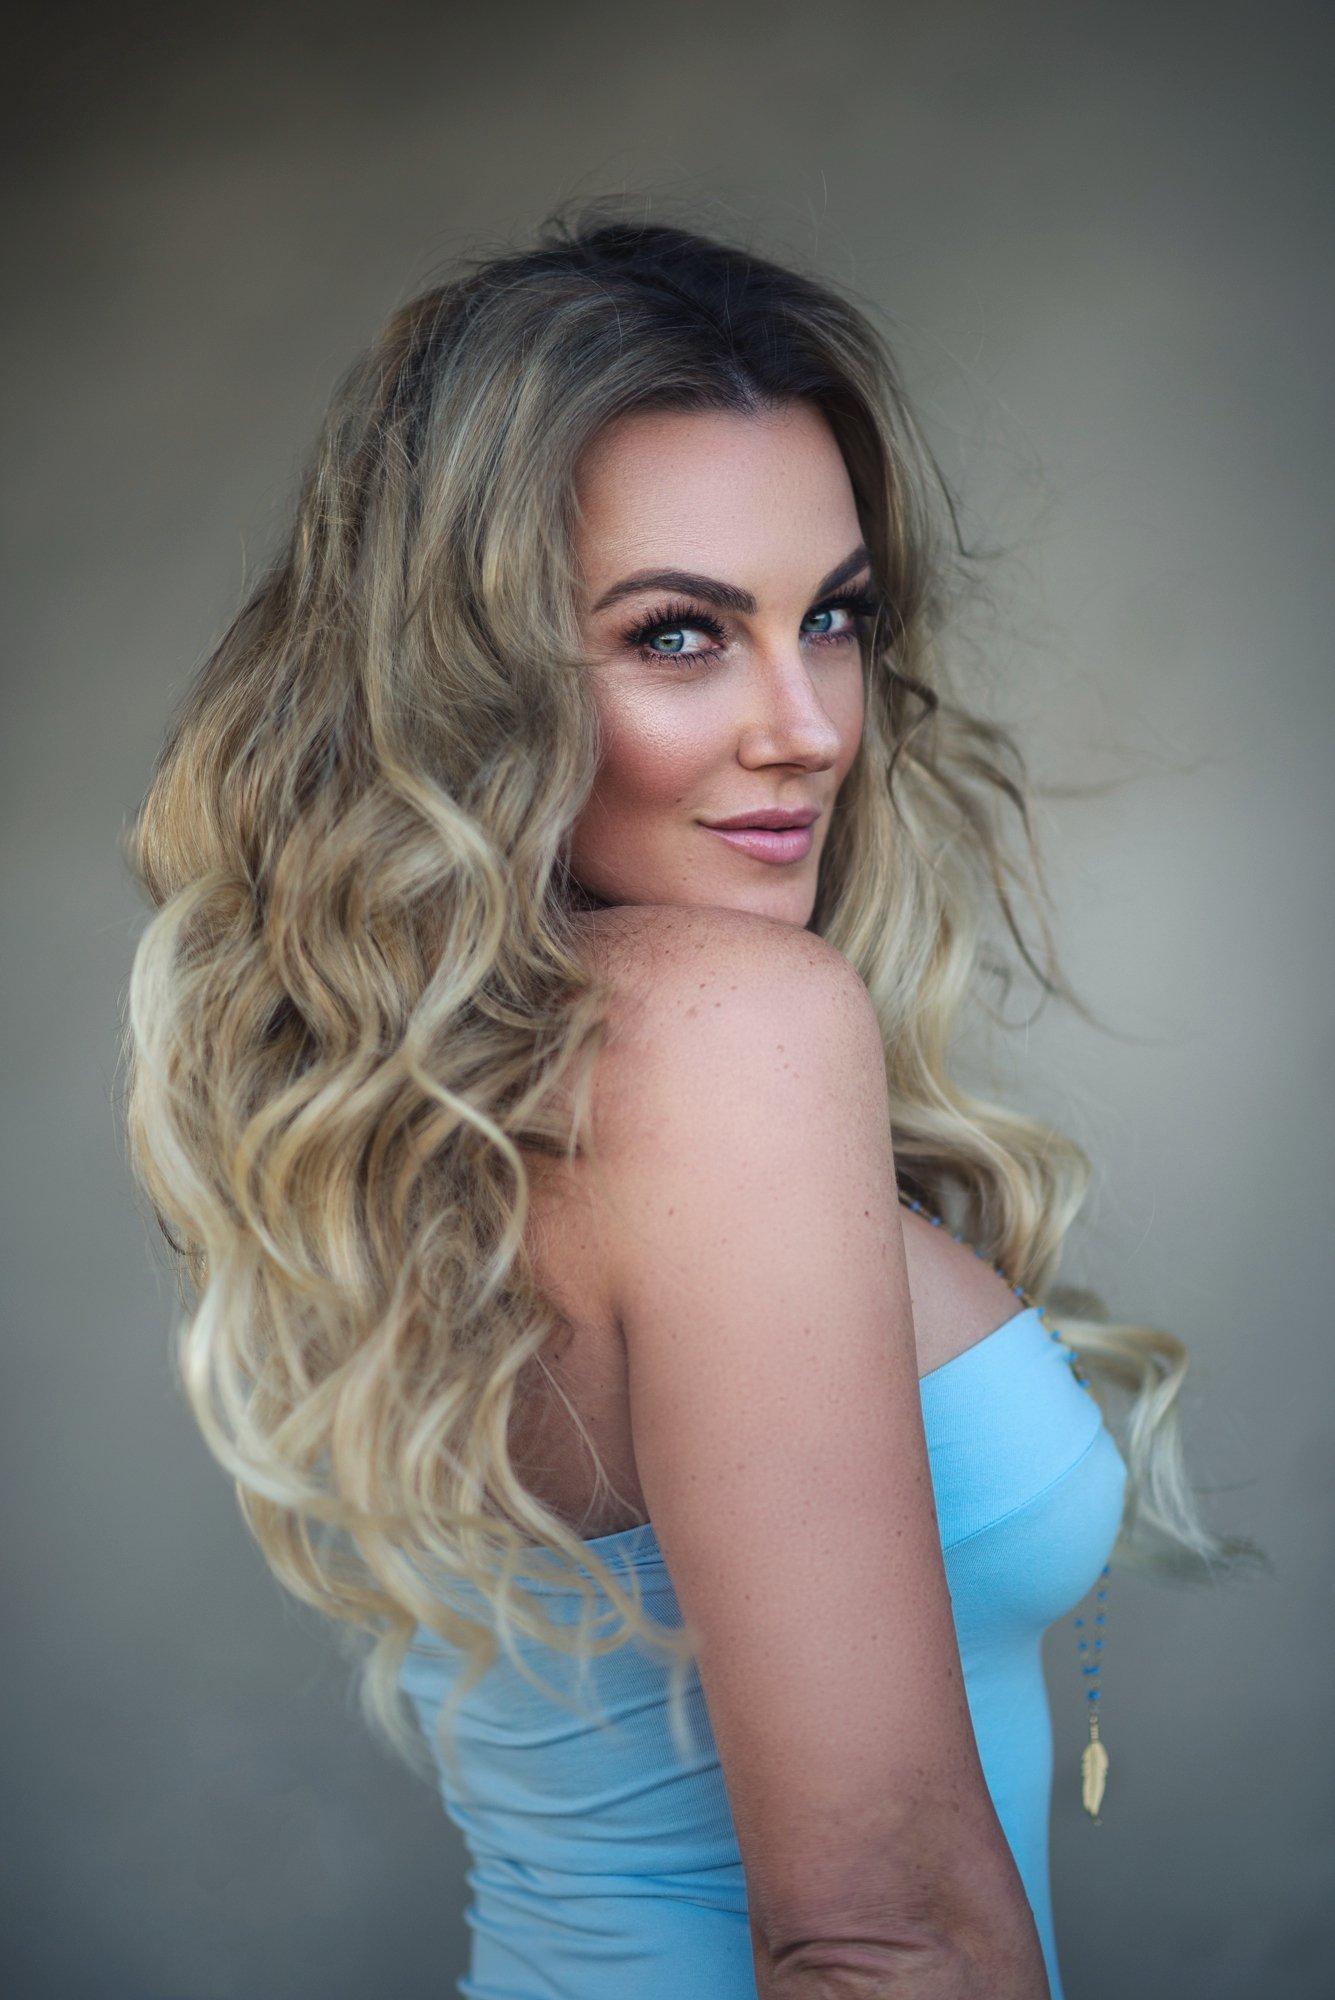 Amber Nichole hot boobs